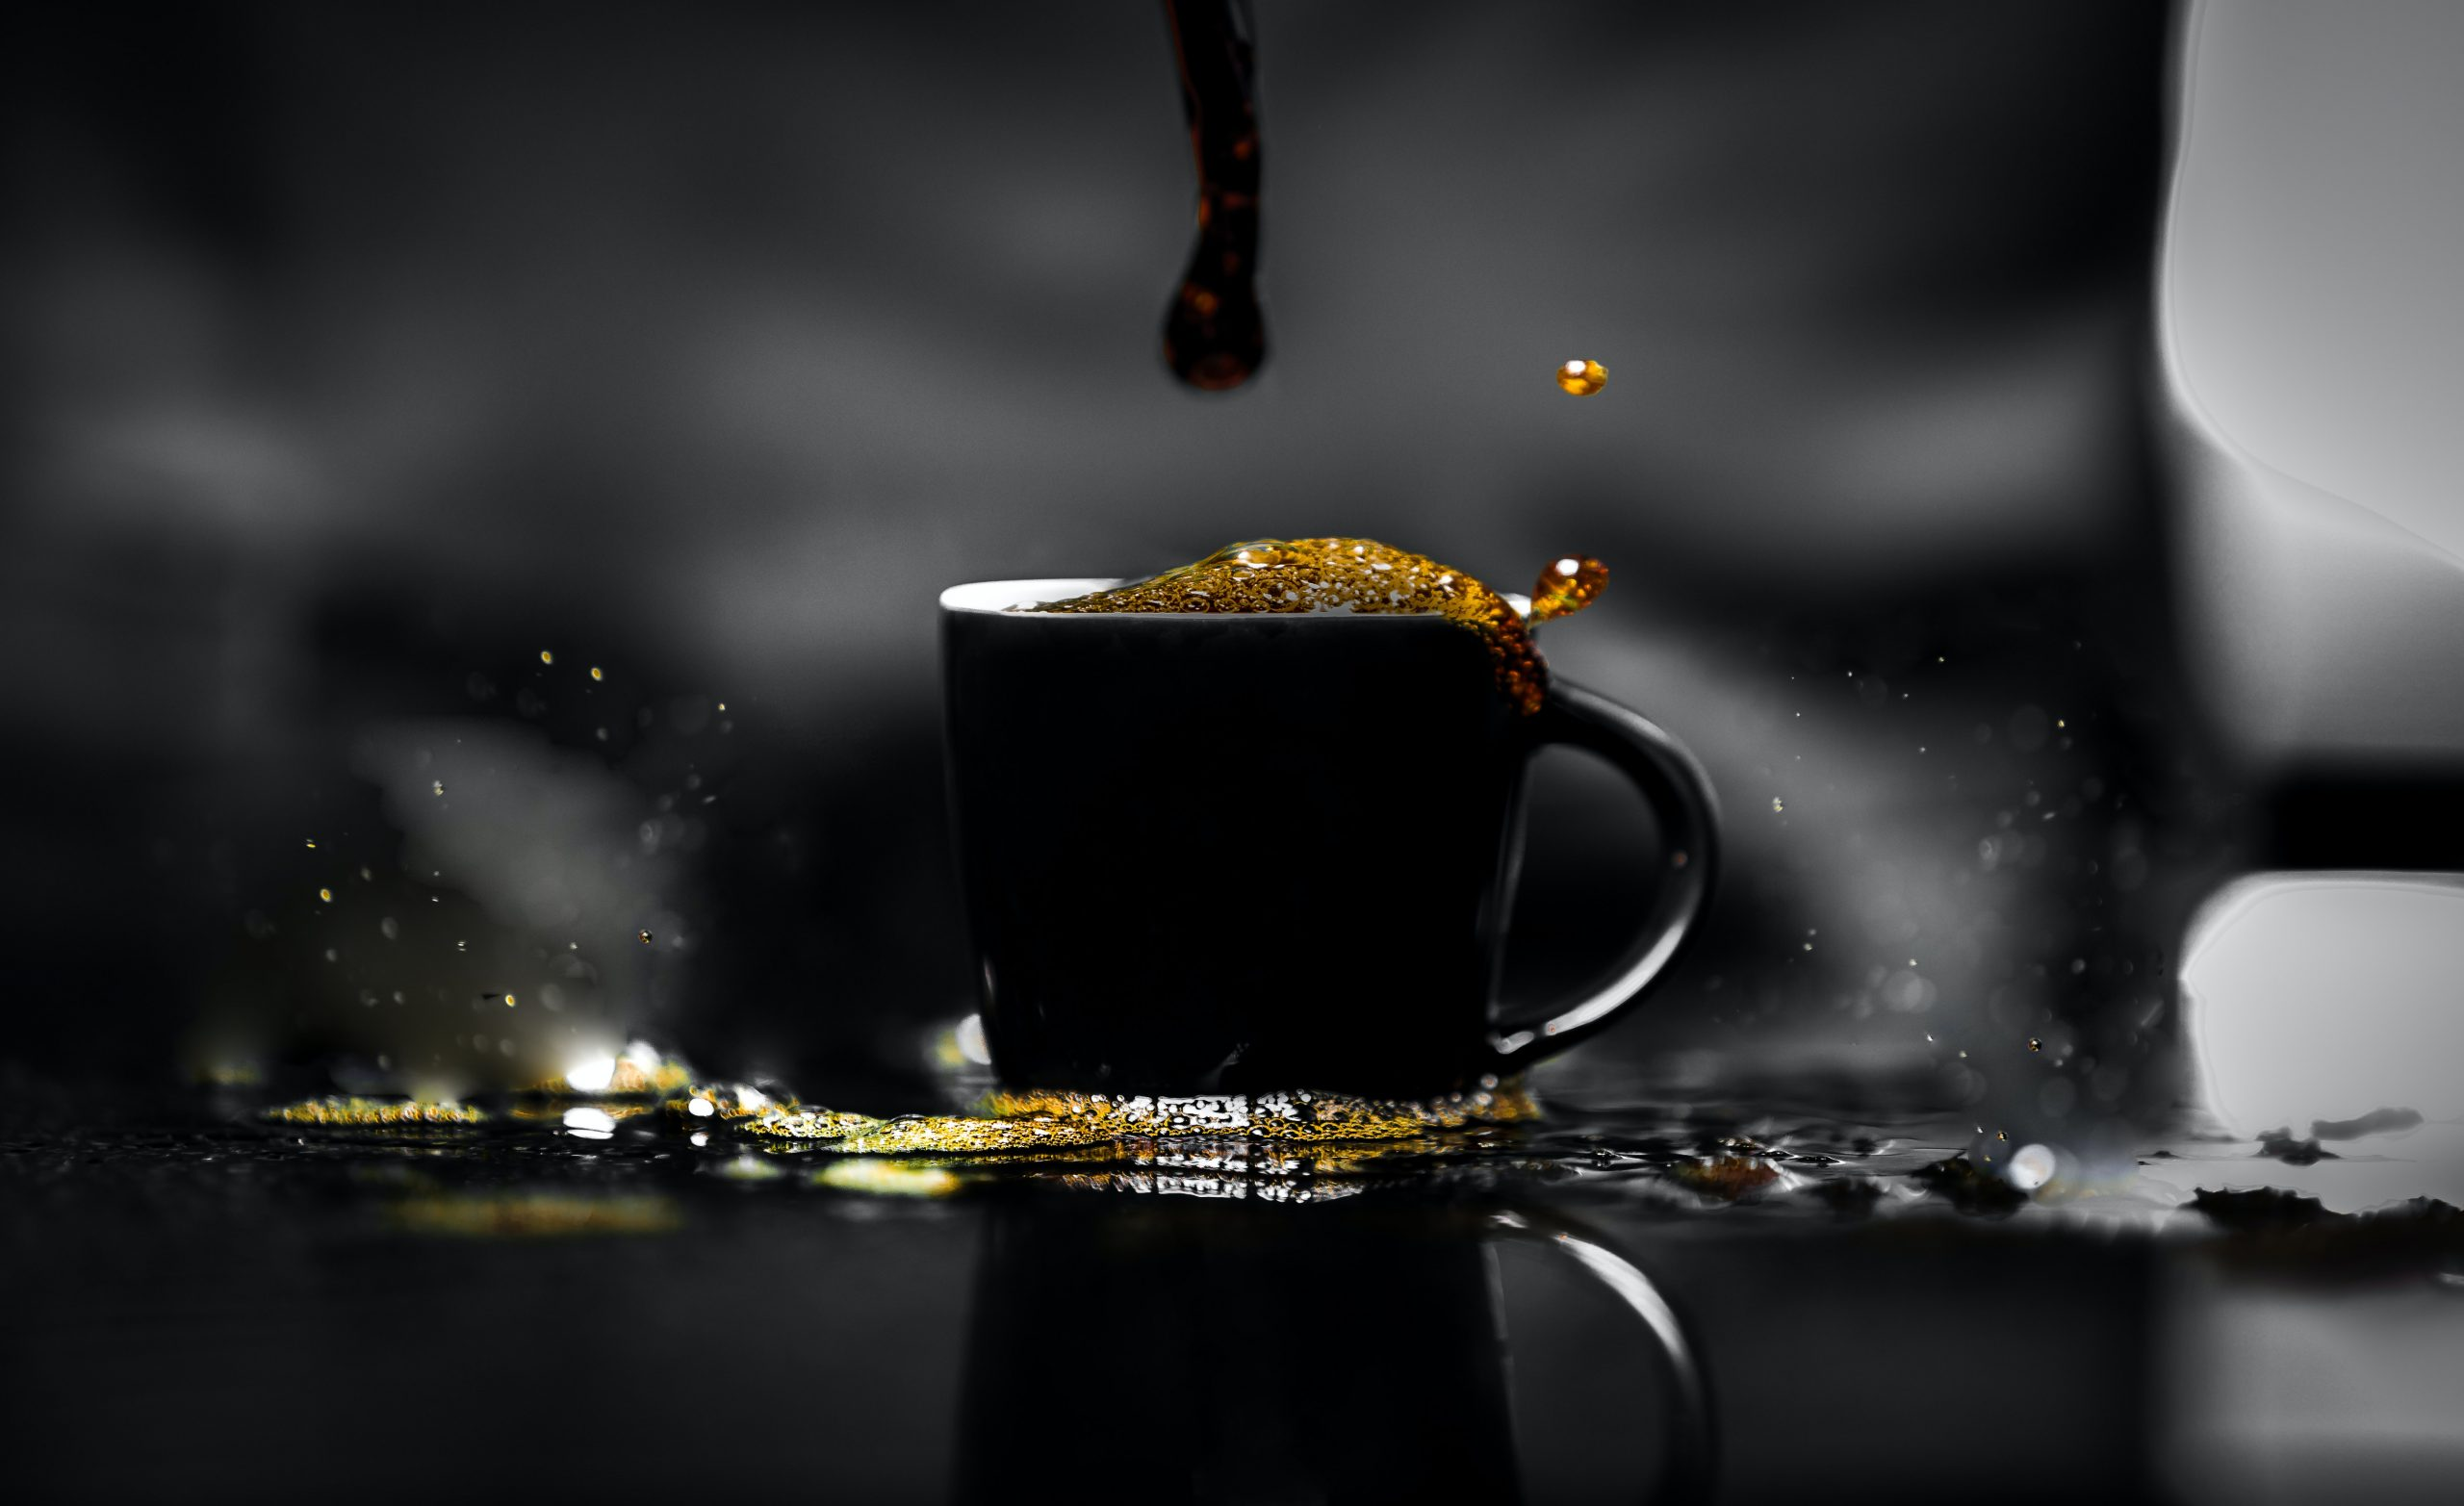 medspresso-CBD-infused-beverage-m2bio-internet-bull-report